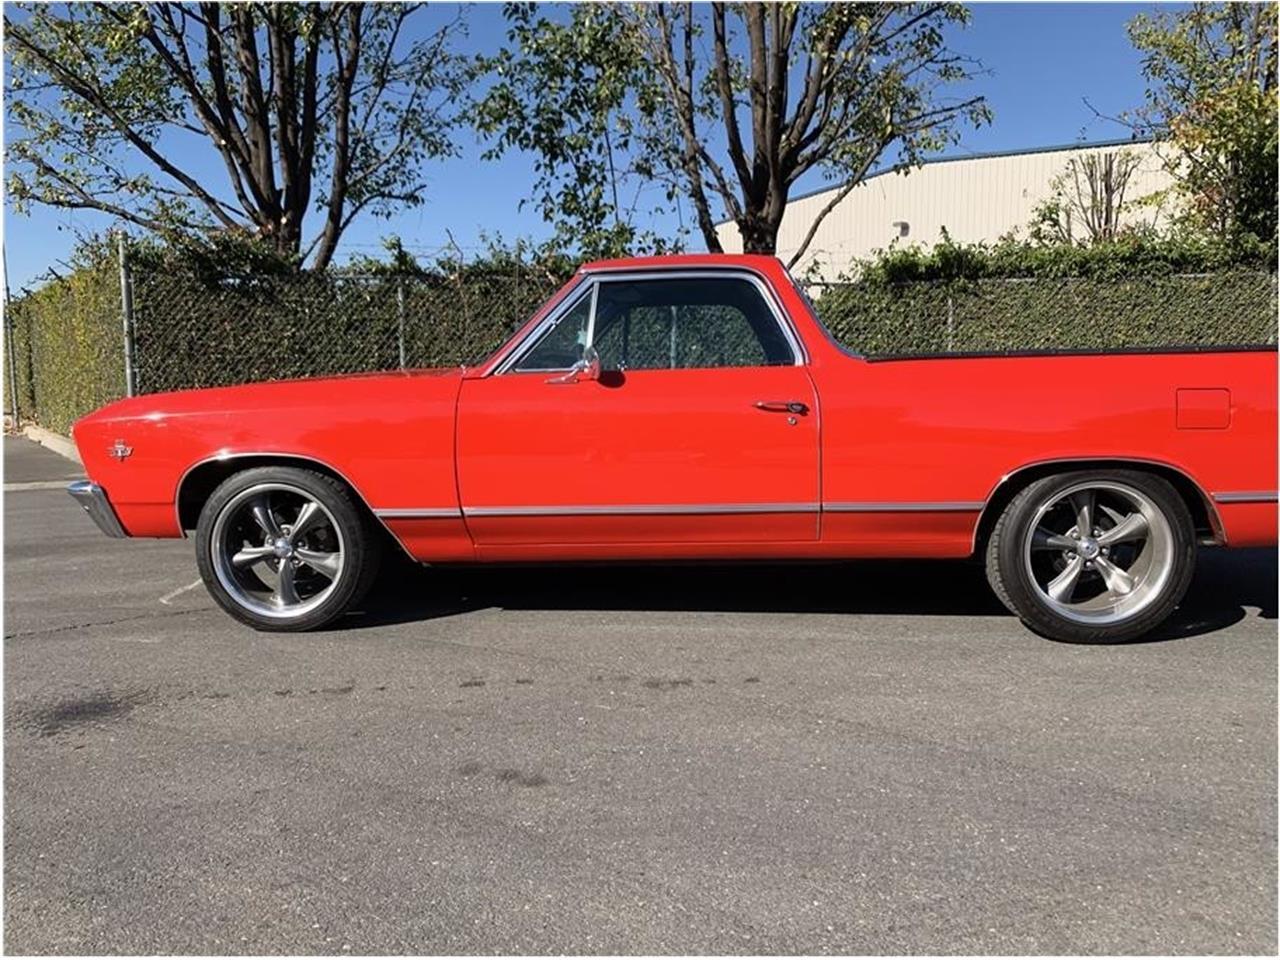 1967 Chevrolet El Camino (CC-1296343) for sale in Roseville, California